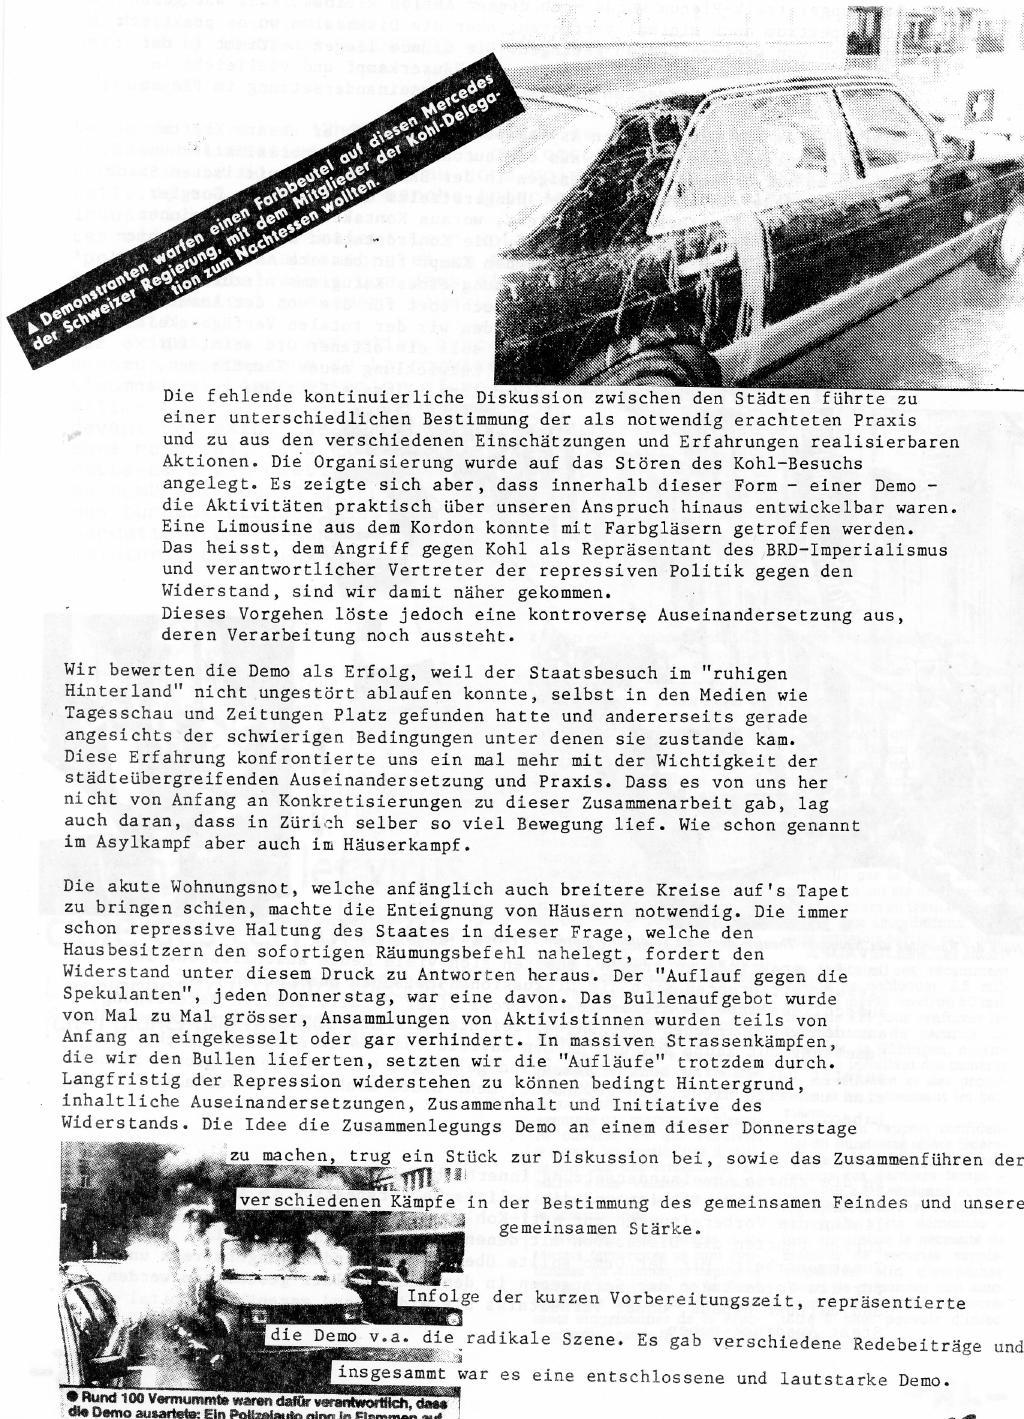 Belgien_Doku_Besetzung_EG_Kommission_1989_018